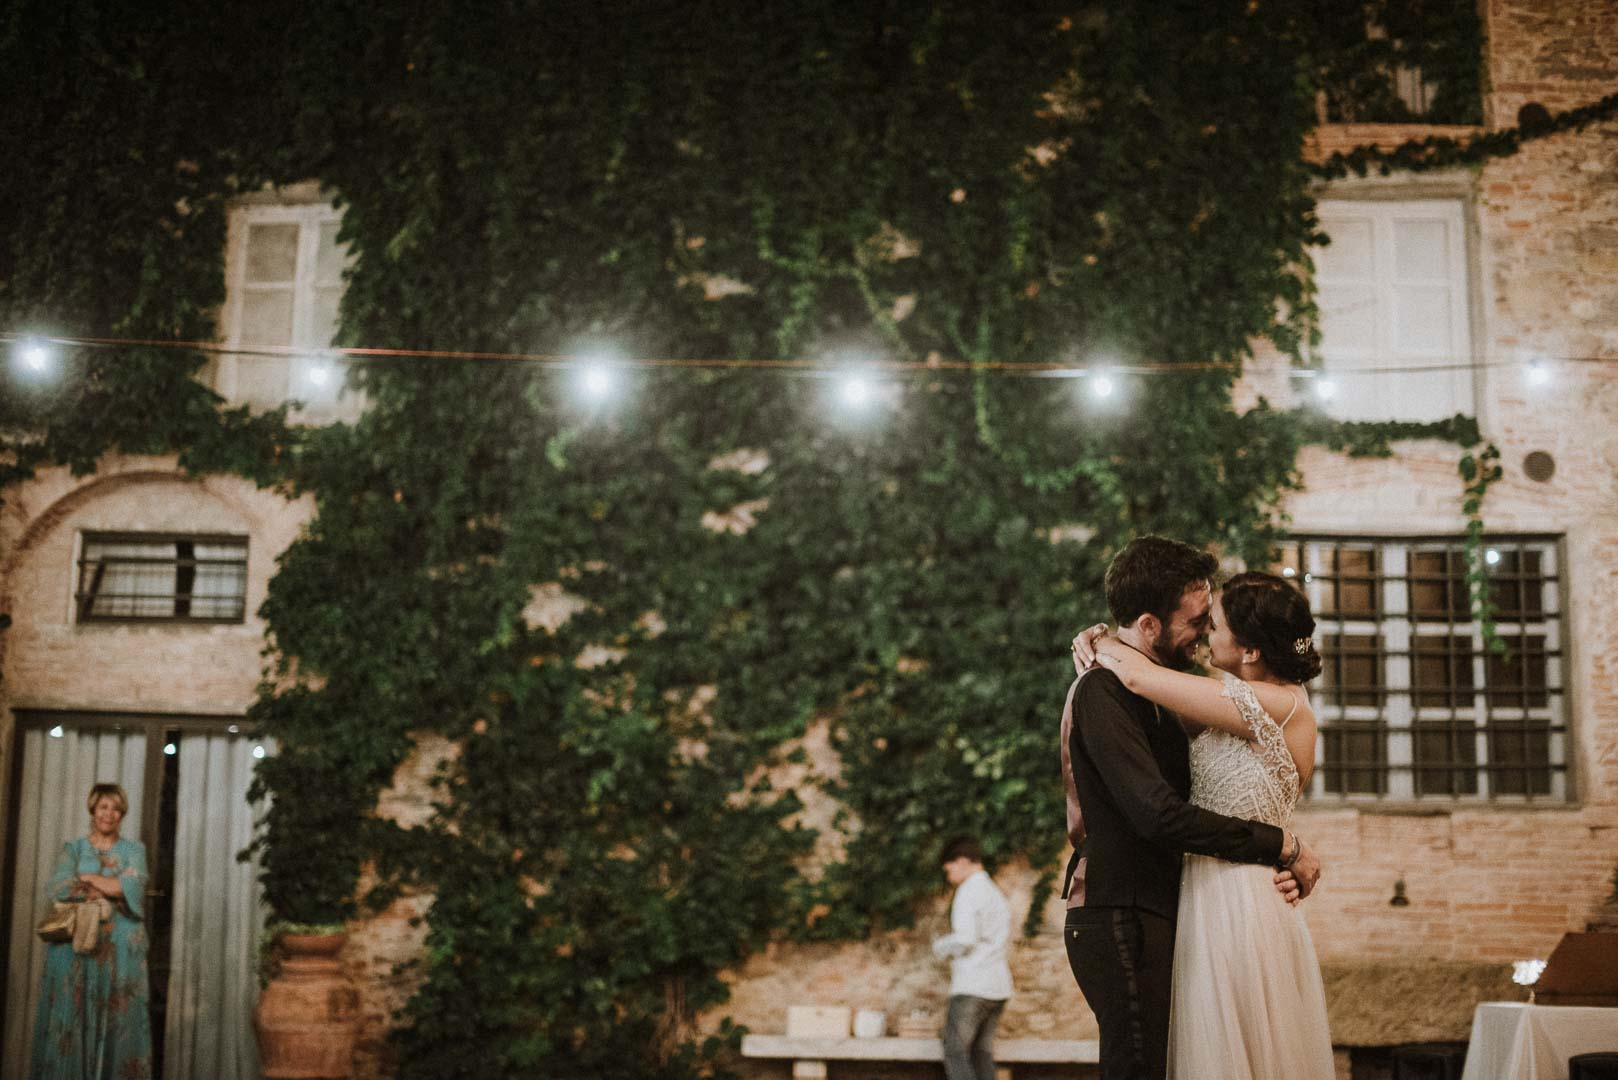 wedding-photographer-destination-fineart-bespoke-reportage-tuscany-villascorzi-vivianeizzo-spazio46-178